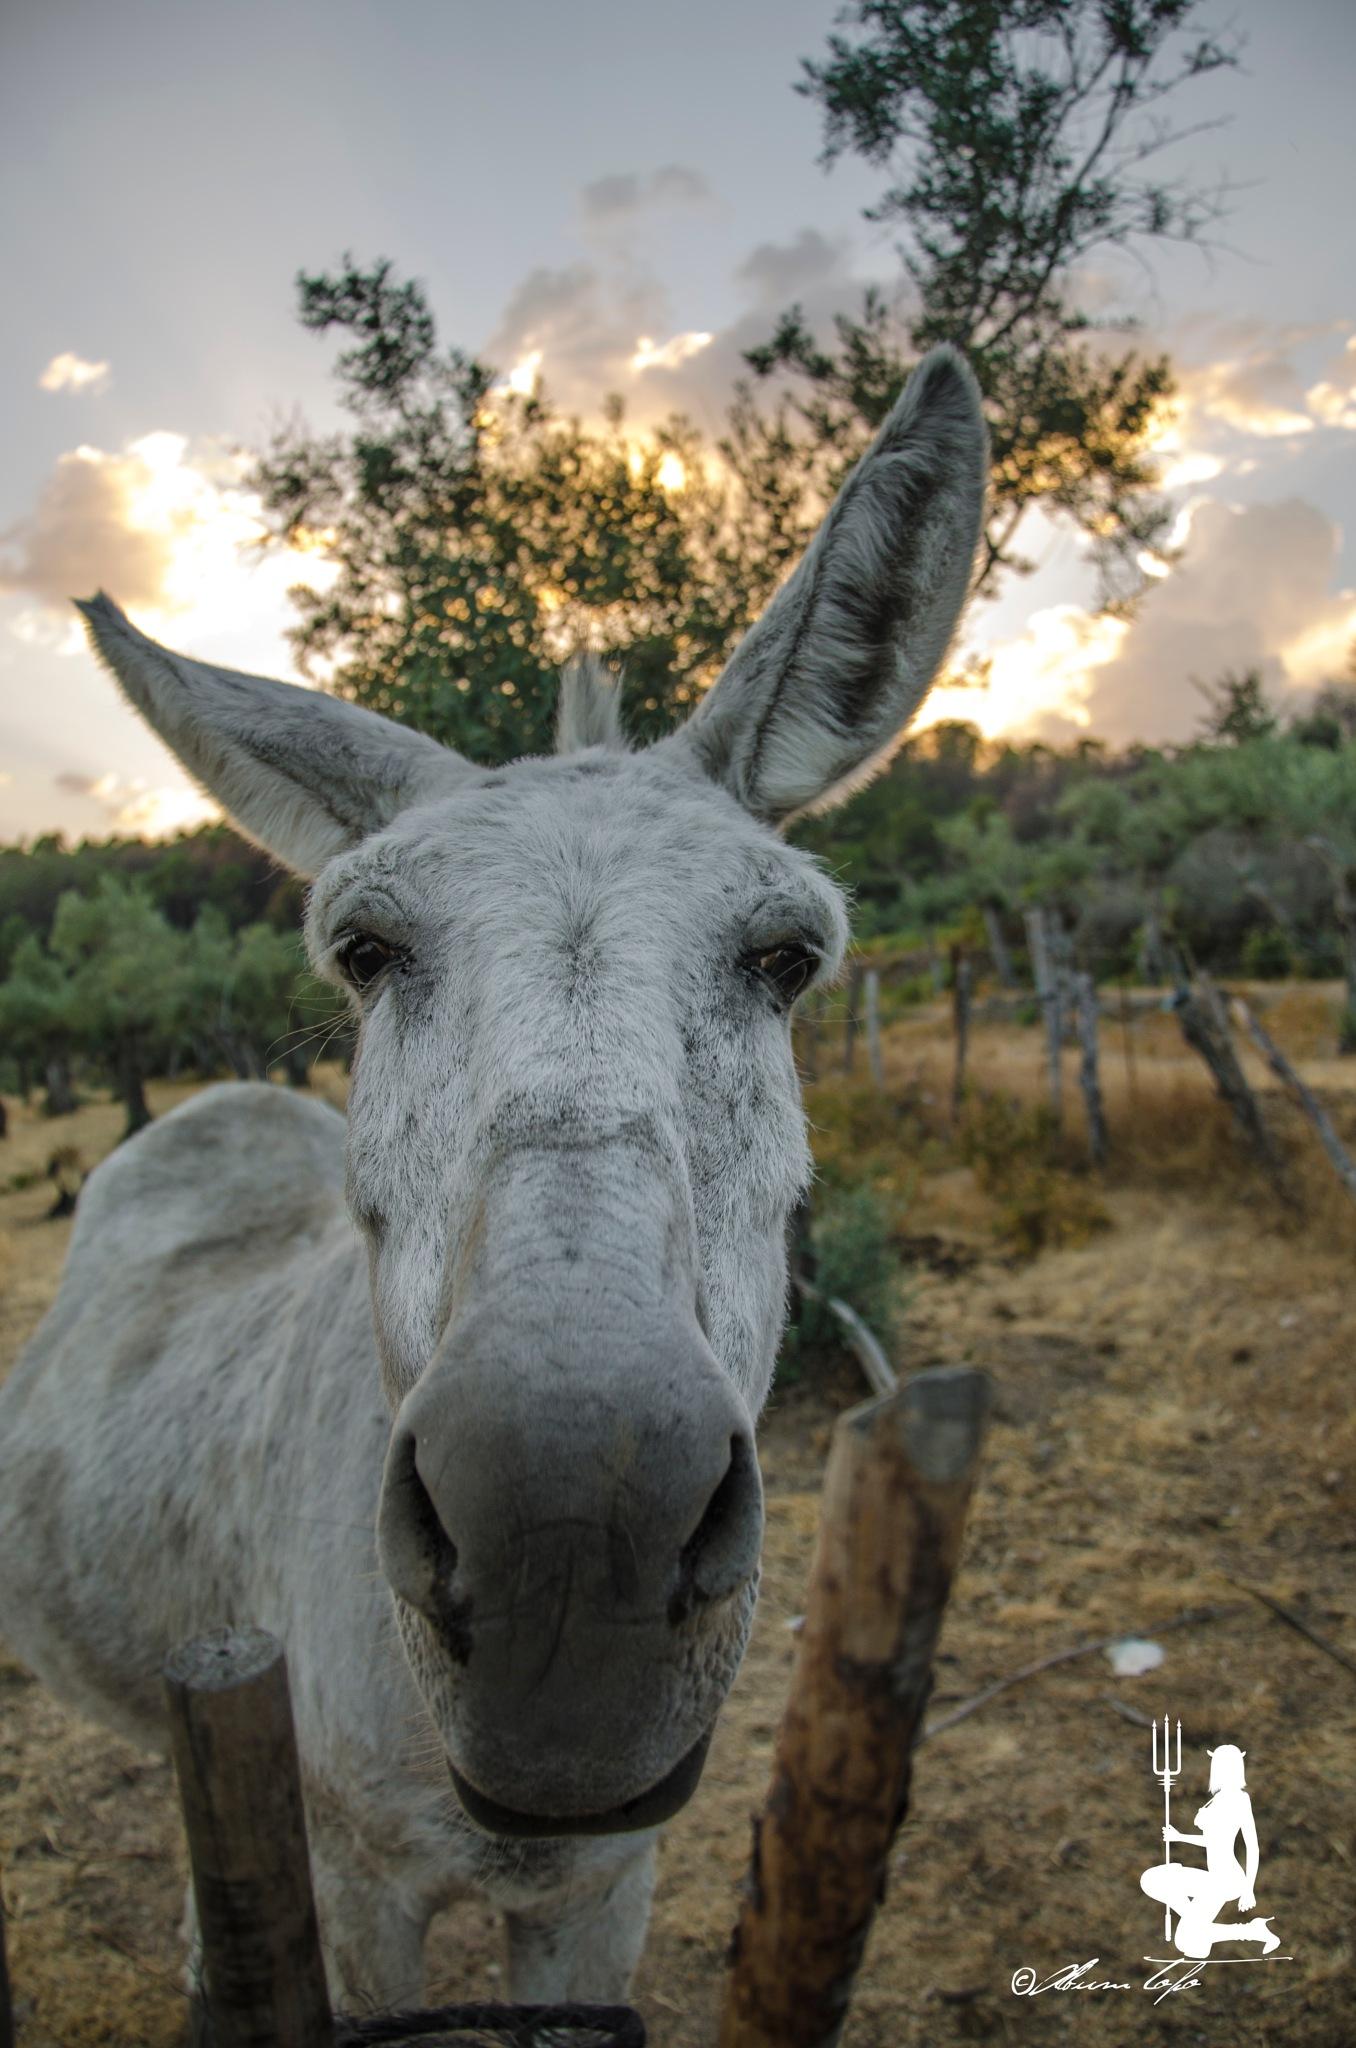 Donkey by Sergio Franco Topo